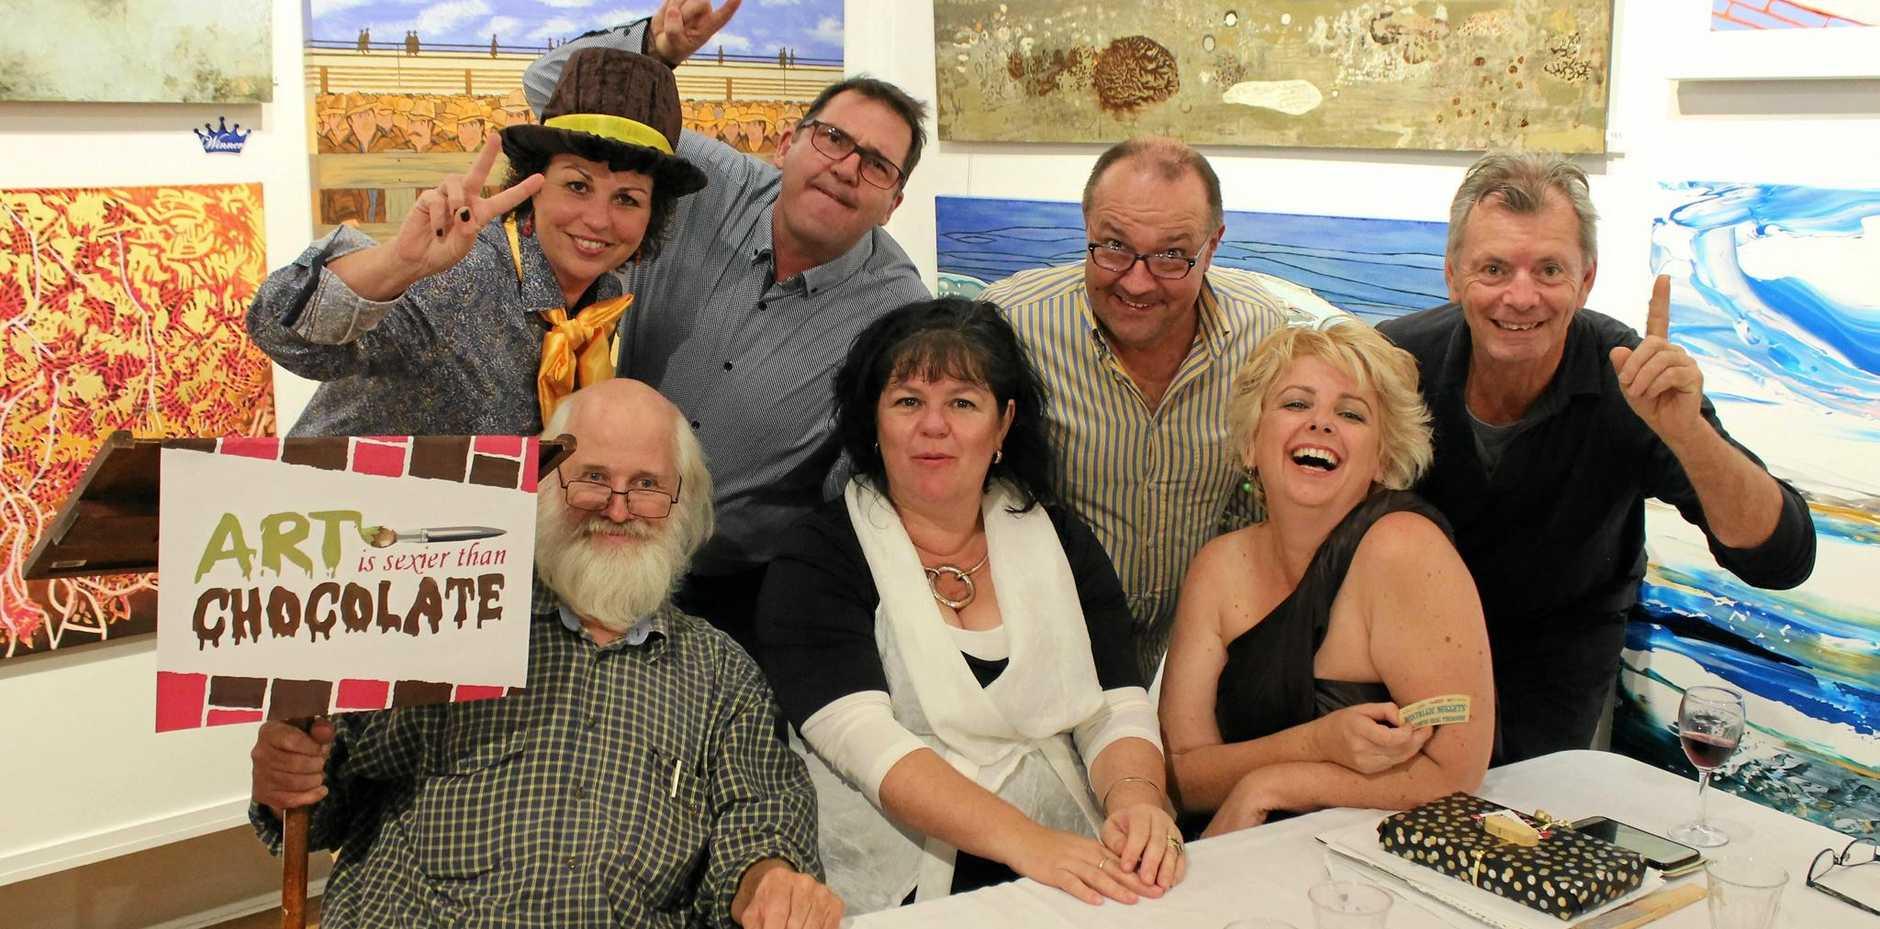 GREAT DEBATE: The 2016 debating teams (back) Karen Blackburn, Bruce Devereaux, MC Cr Daryl Dodt, Warren Read and (front) Ian Mackay, Janet Lee and Audrey Plate.